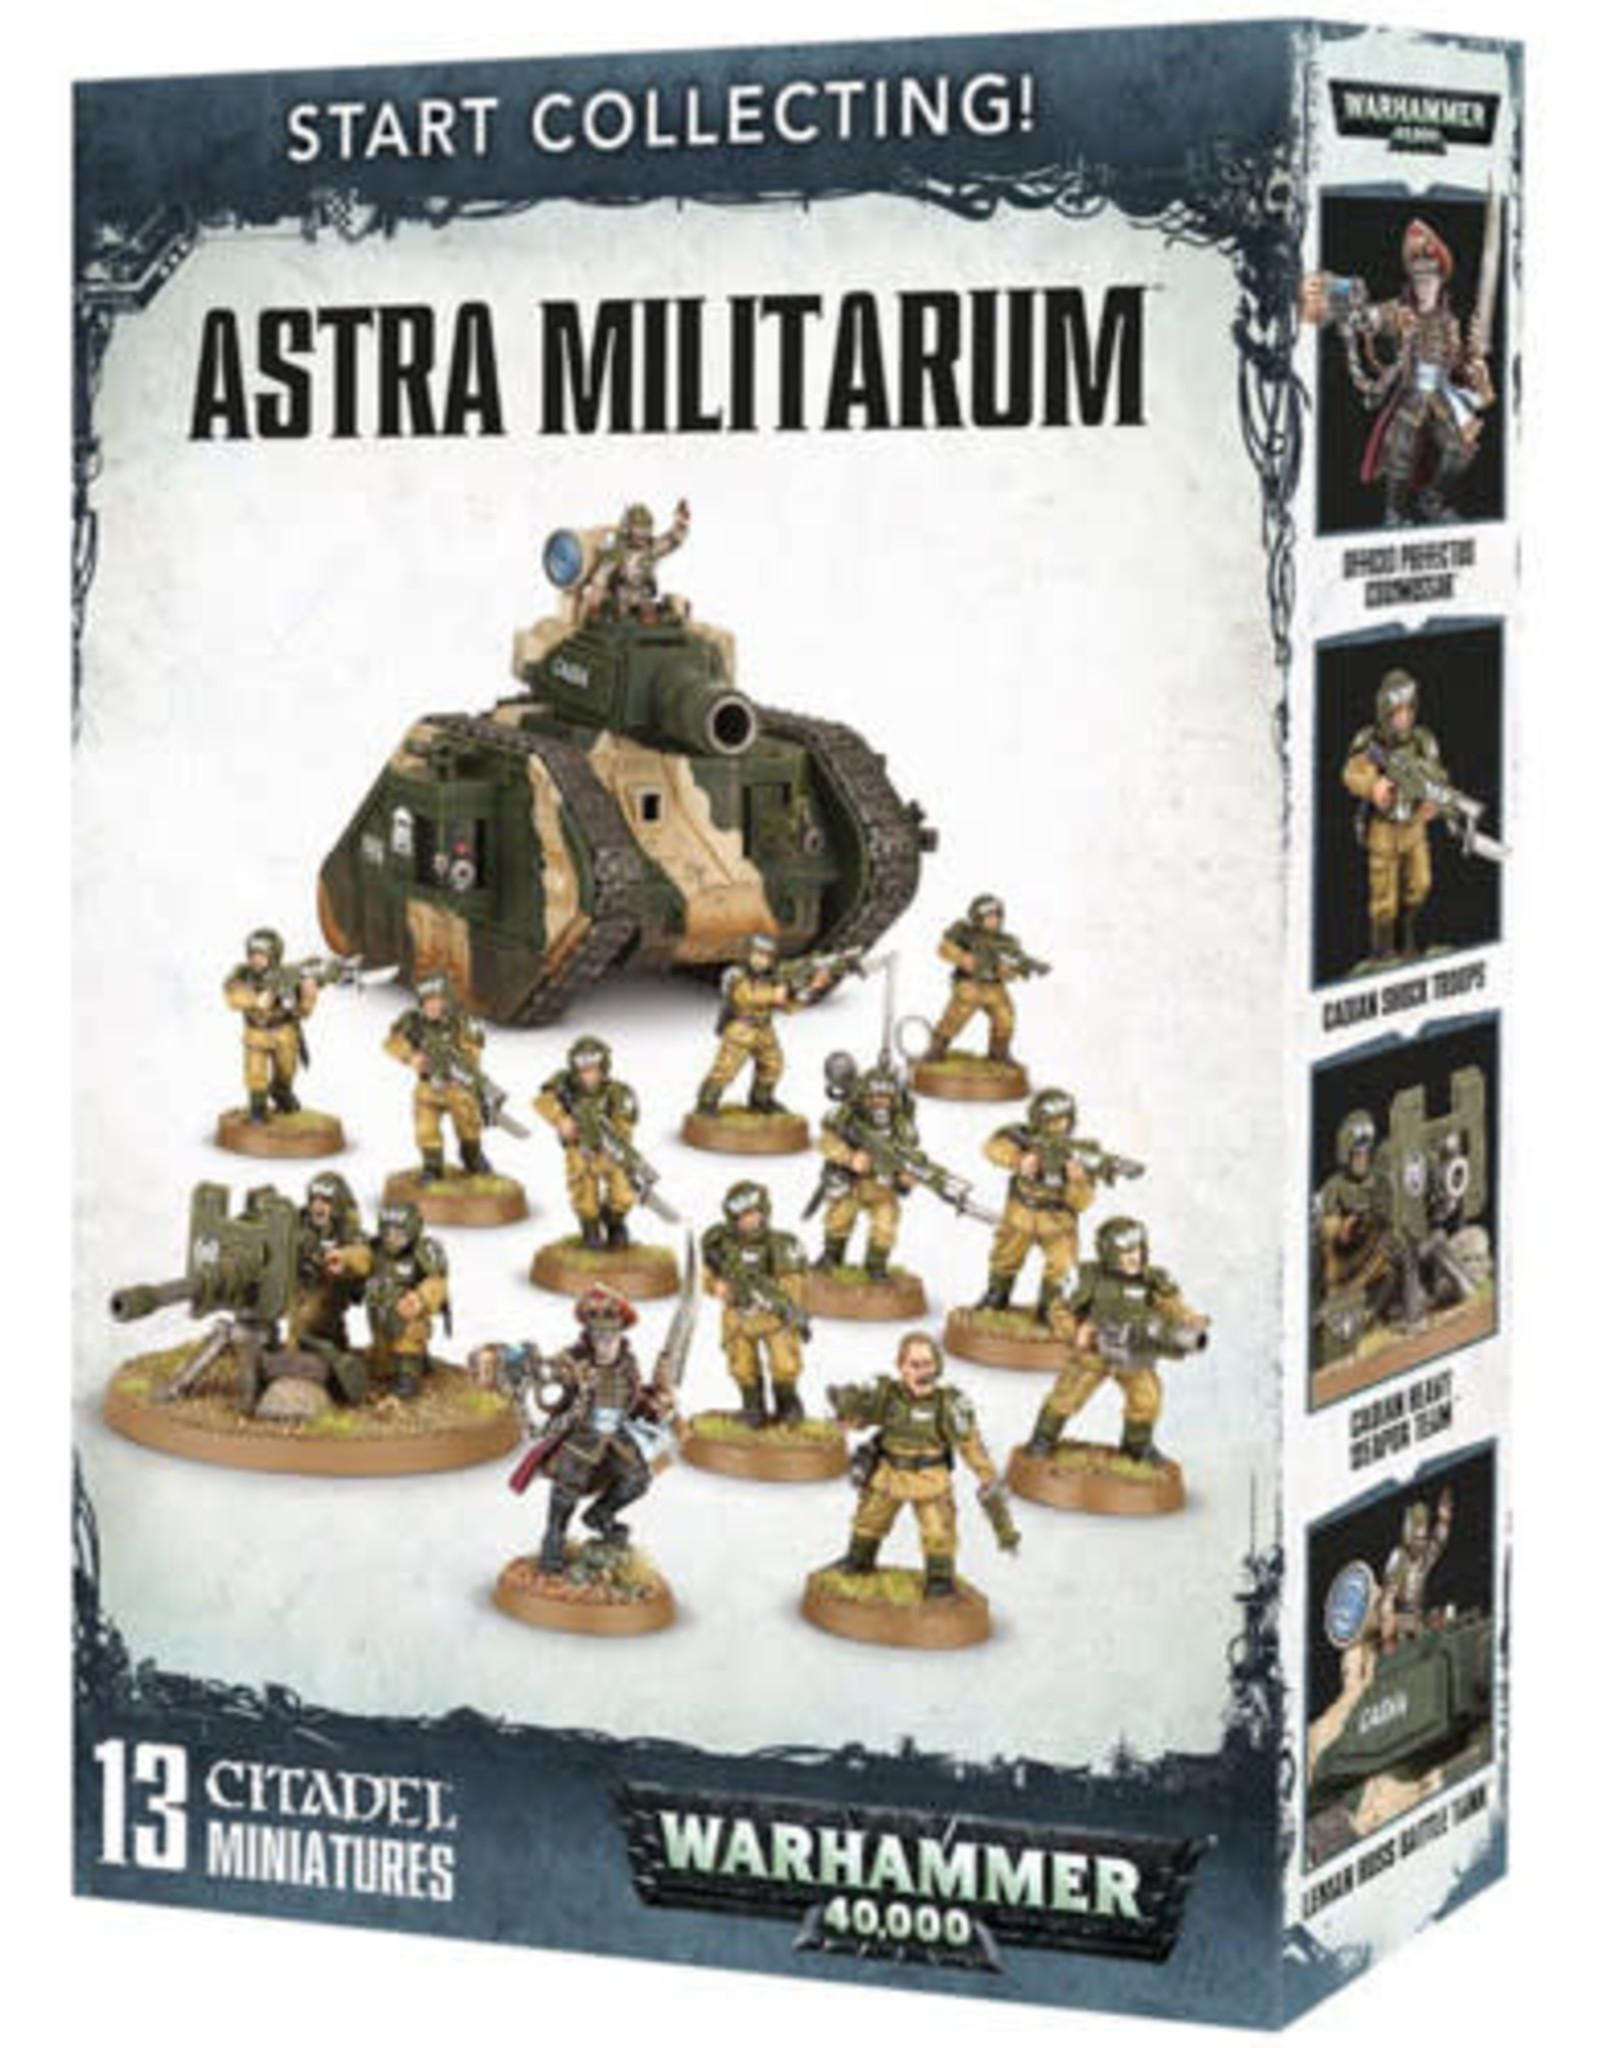 Games Workshop Warhammer 40K Start Collecting! Astra Militarum